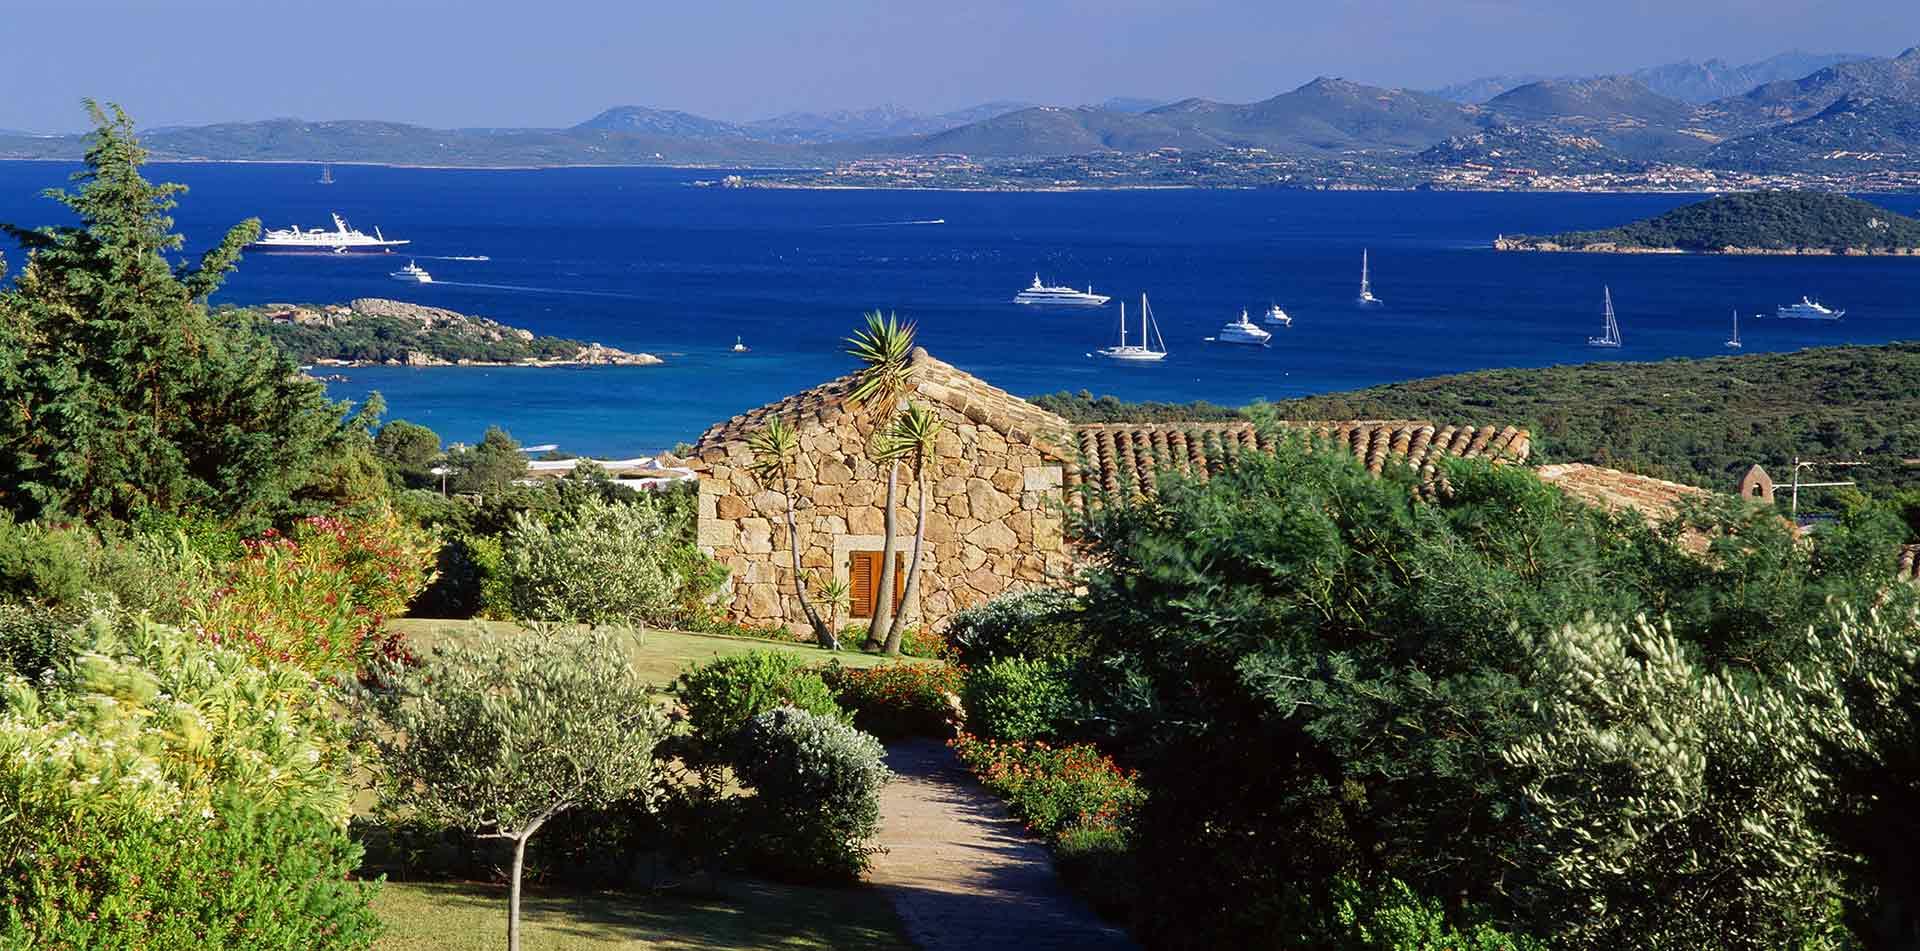 Costa Smeralda in Sardinia, Italy